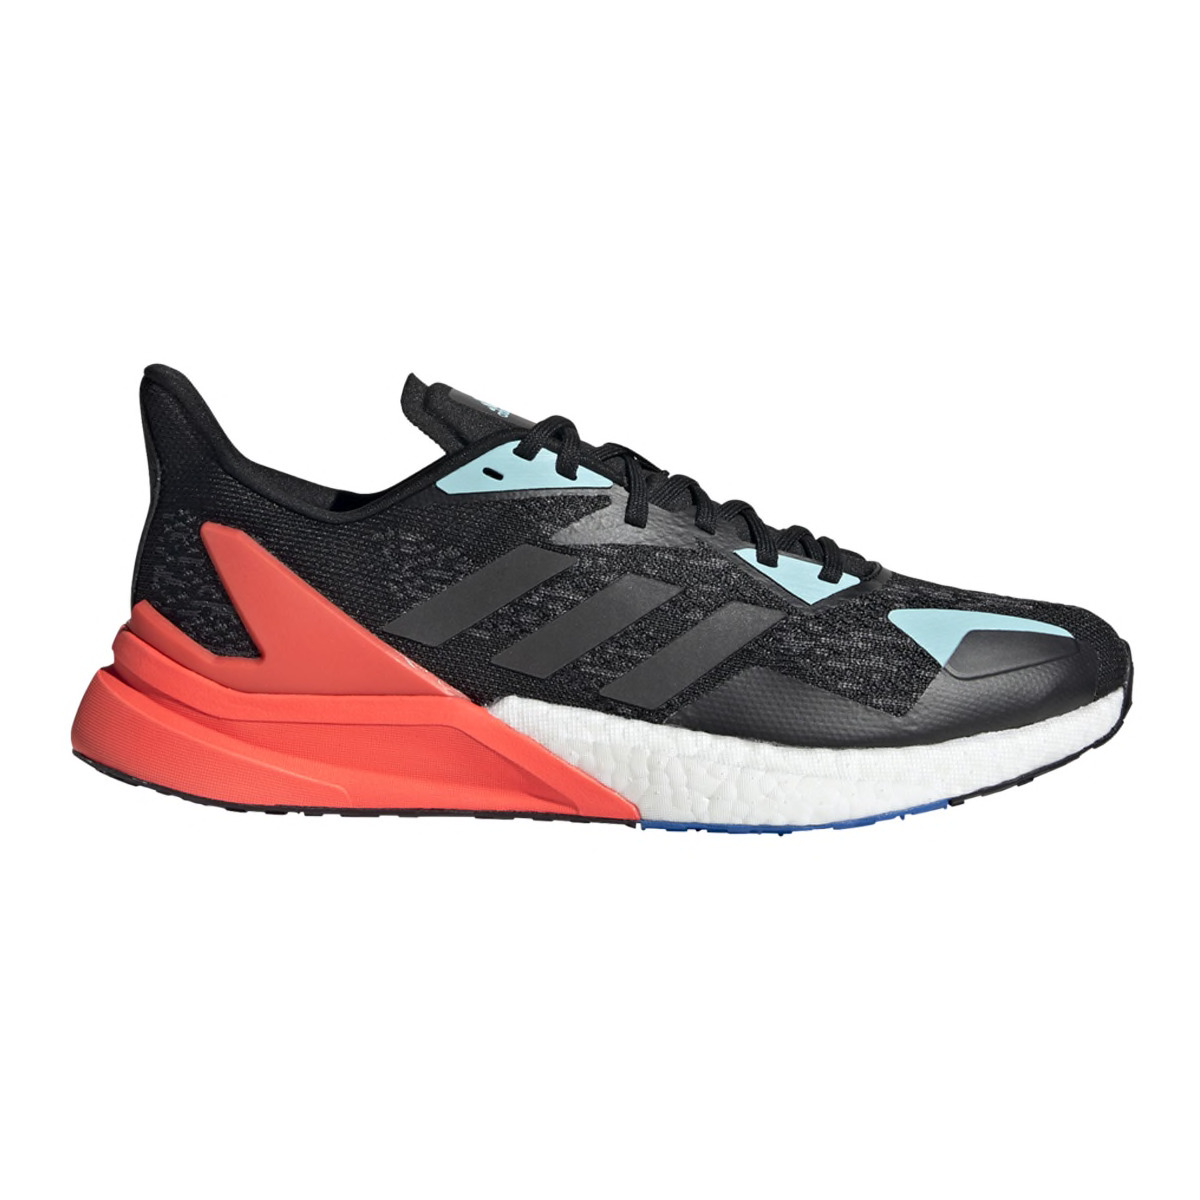 Zapatillas casual de hombre X9000L3 adidas Originals